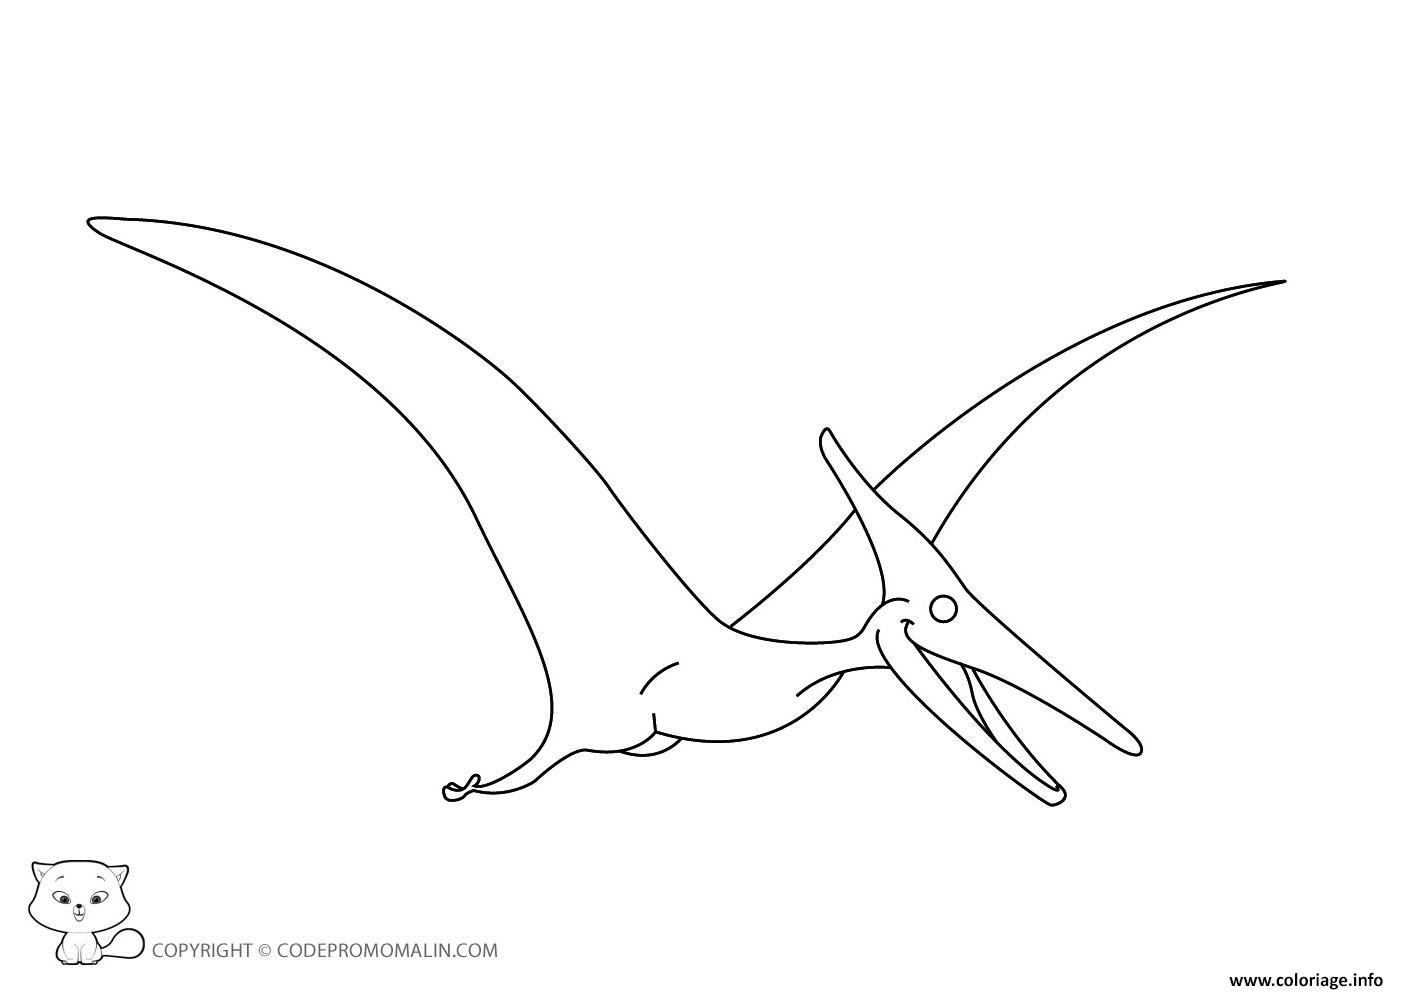 Coloriage Dinosaure 147 Dessin  Imprimer